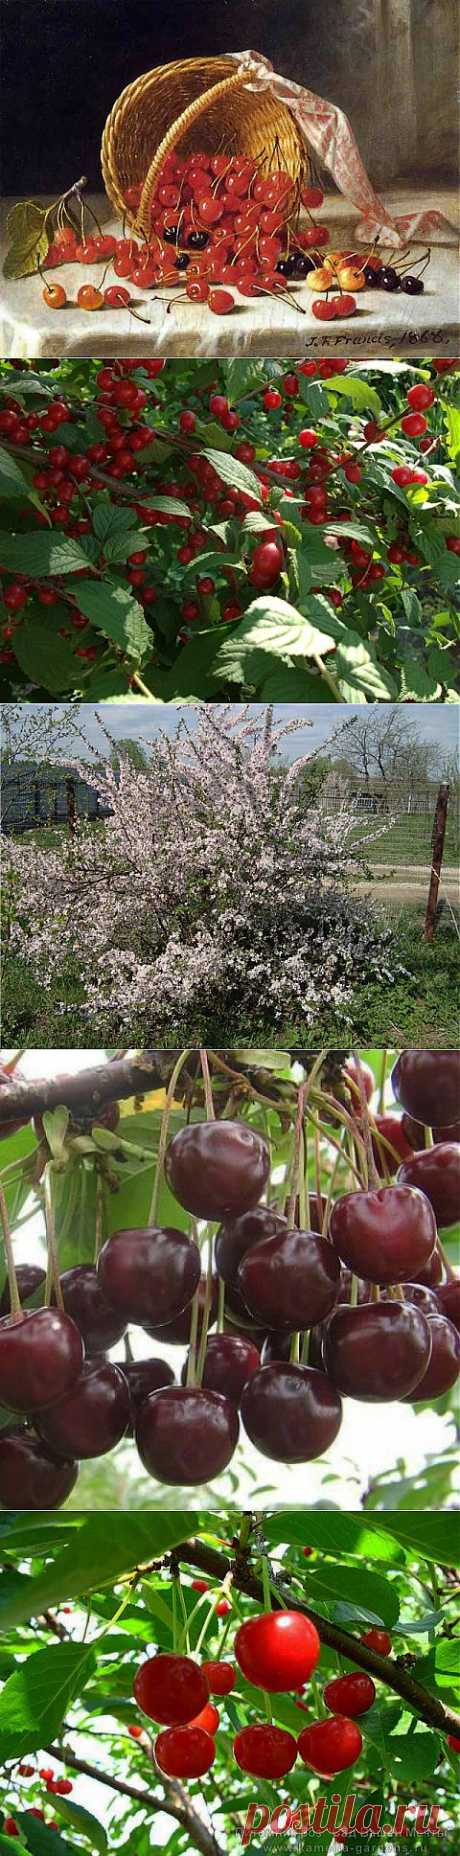 Наполняет летом сад спелых вишен аромат.